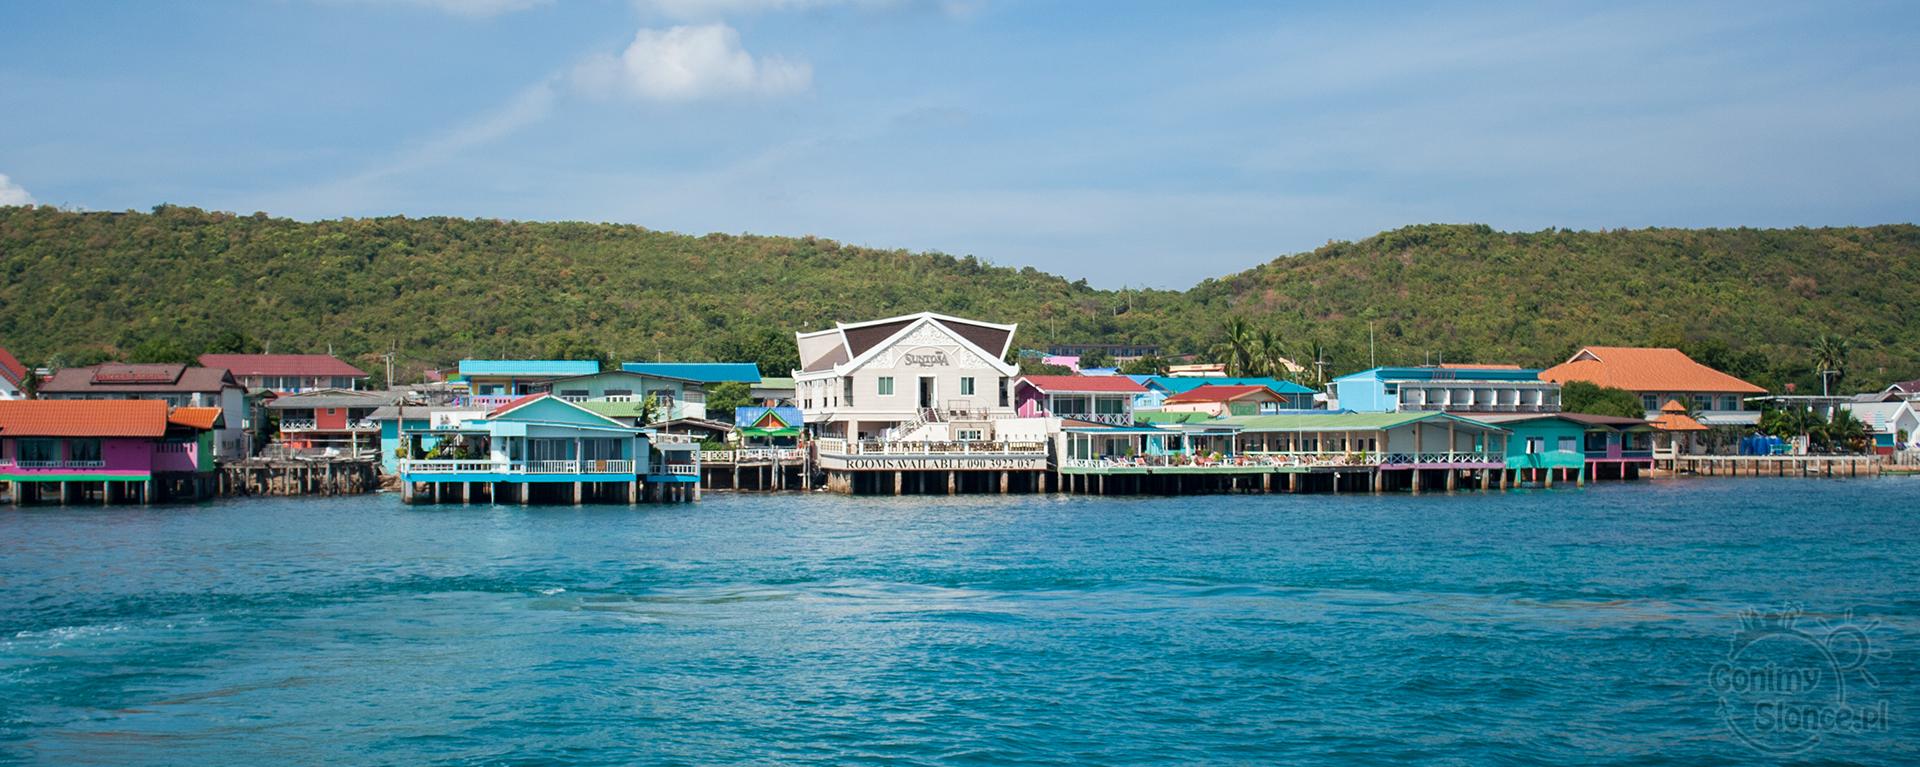 Koh Larn, ransja wyspa w Tajlandii blisko Bangkoku